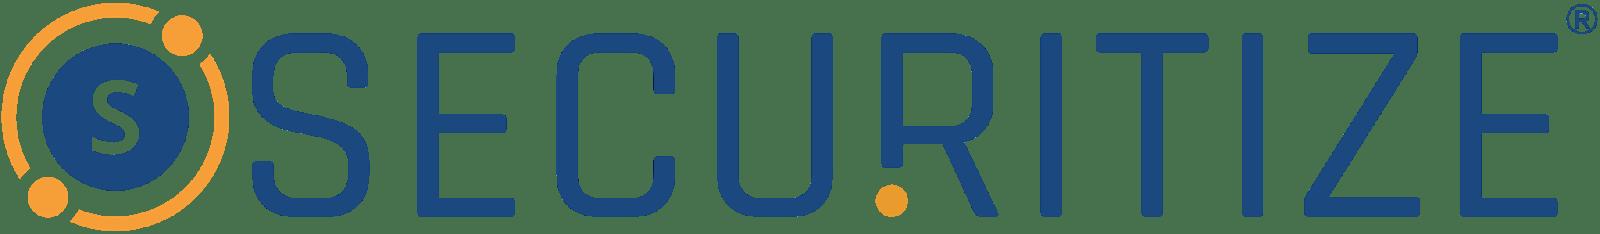 Securitize logo tokenization platform and transfer agent for Liberty Real Estate Fund